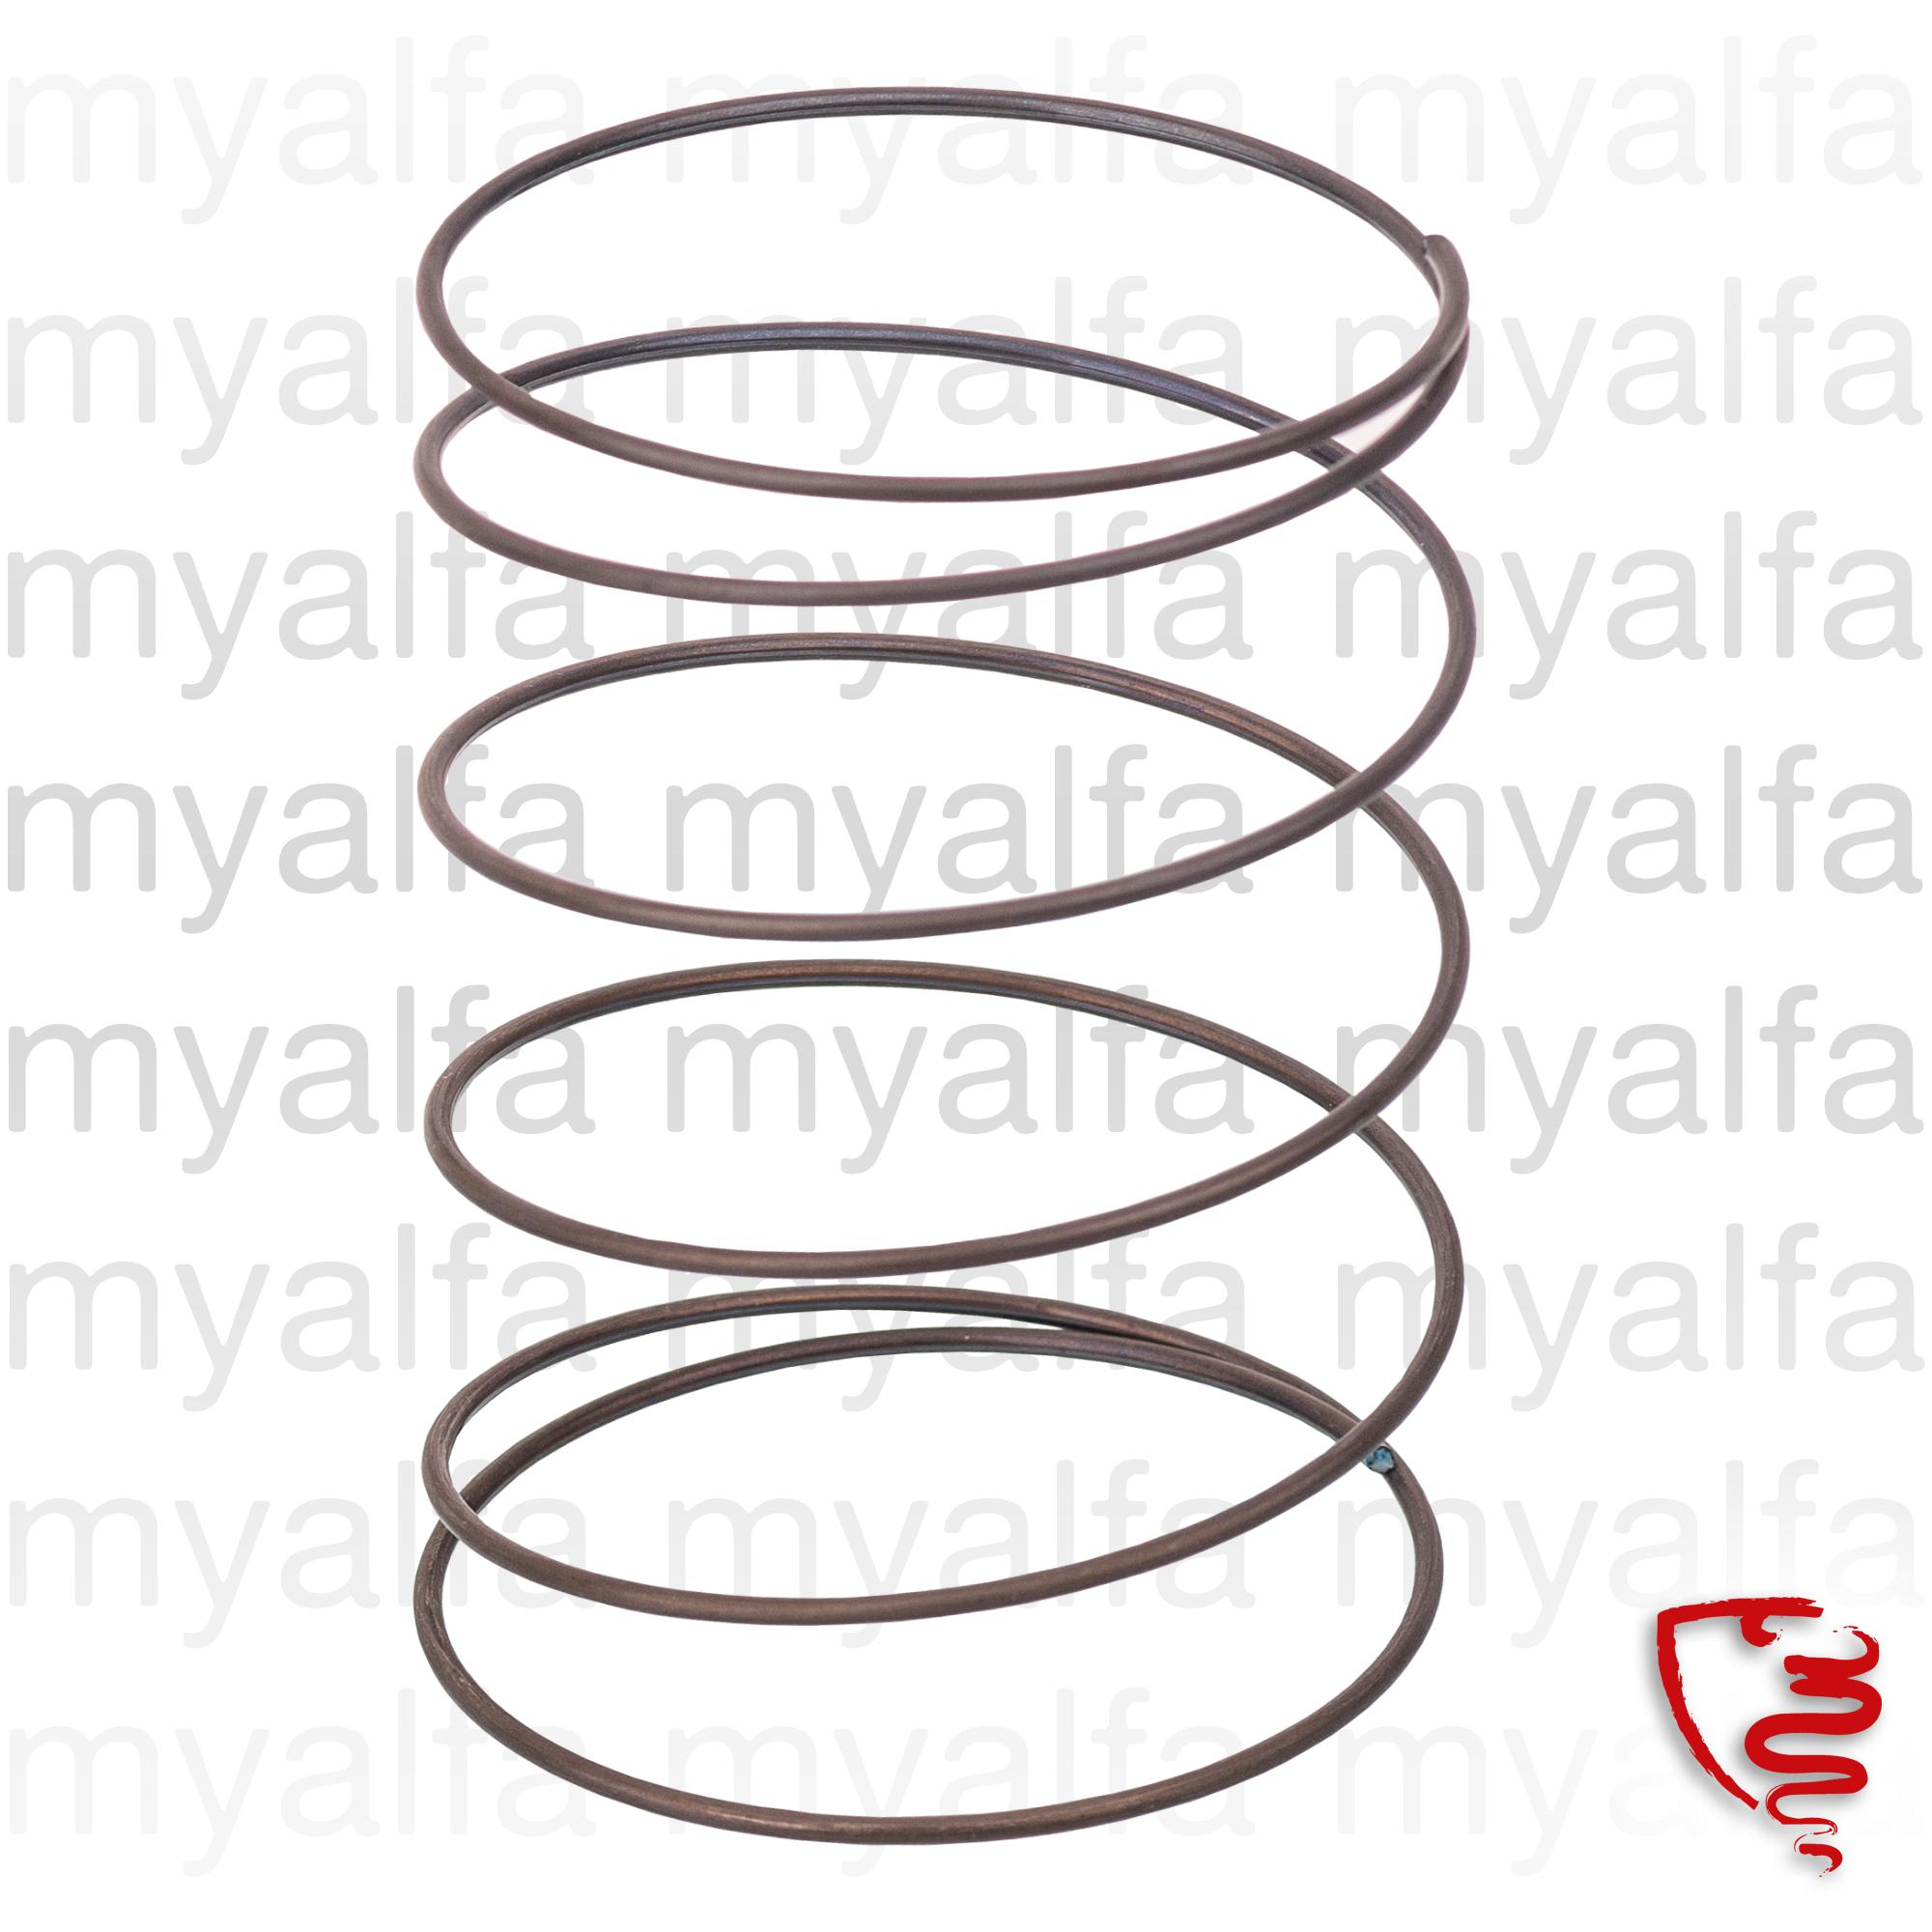 Spring top center wheel 1300 750/101 for 750/101, Interior, Steering wheels, Steering hubs